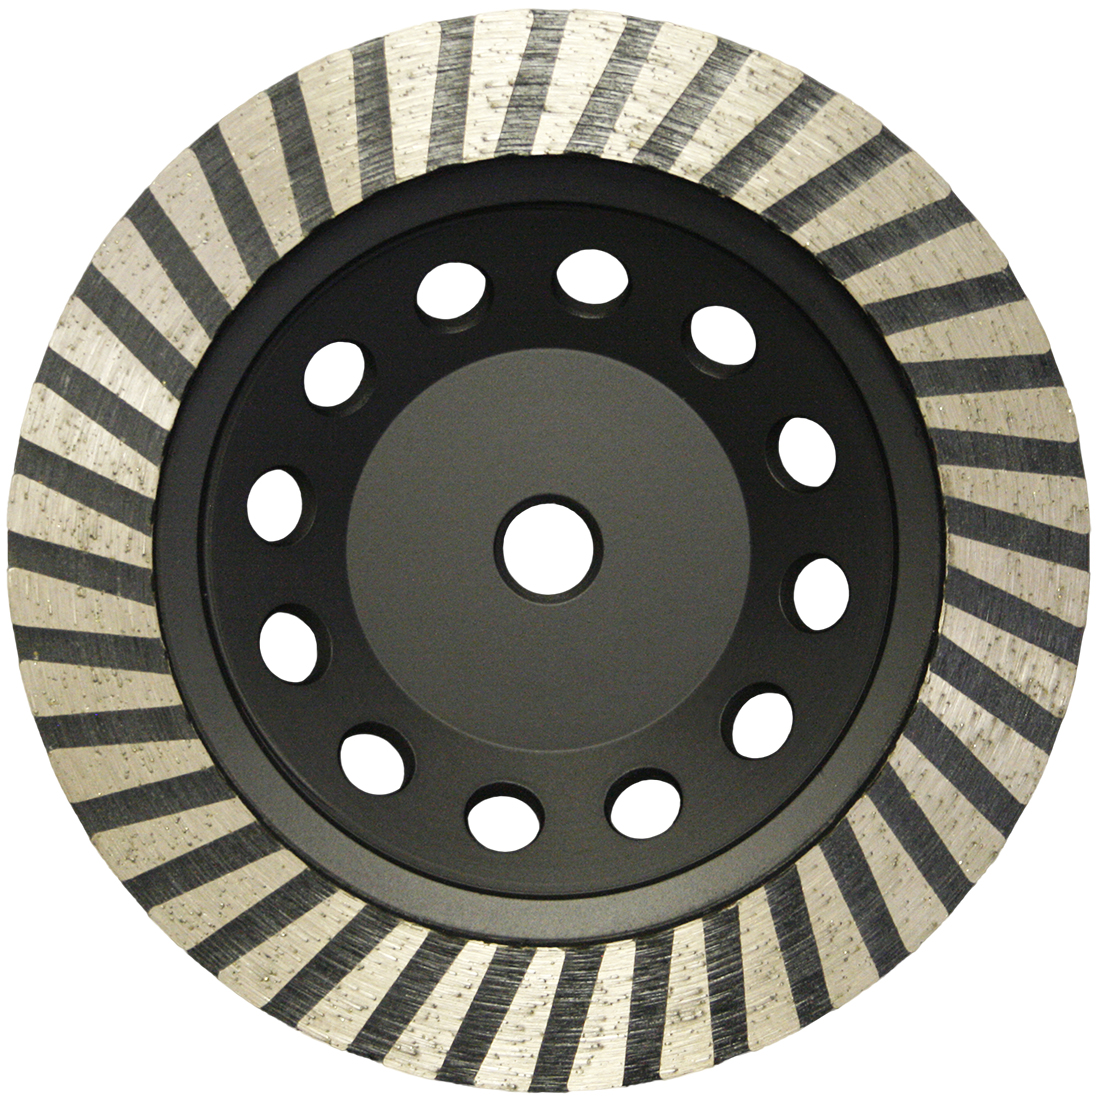 4 Piece X 4 inch Coarse Grinding Diamond Turbo Cup Wheel 5//8-11 Granite Concrete